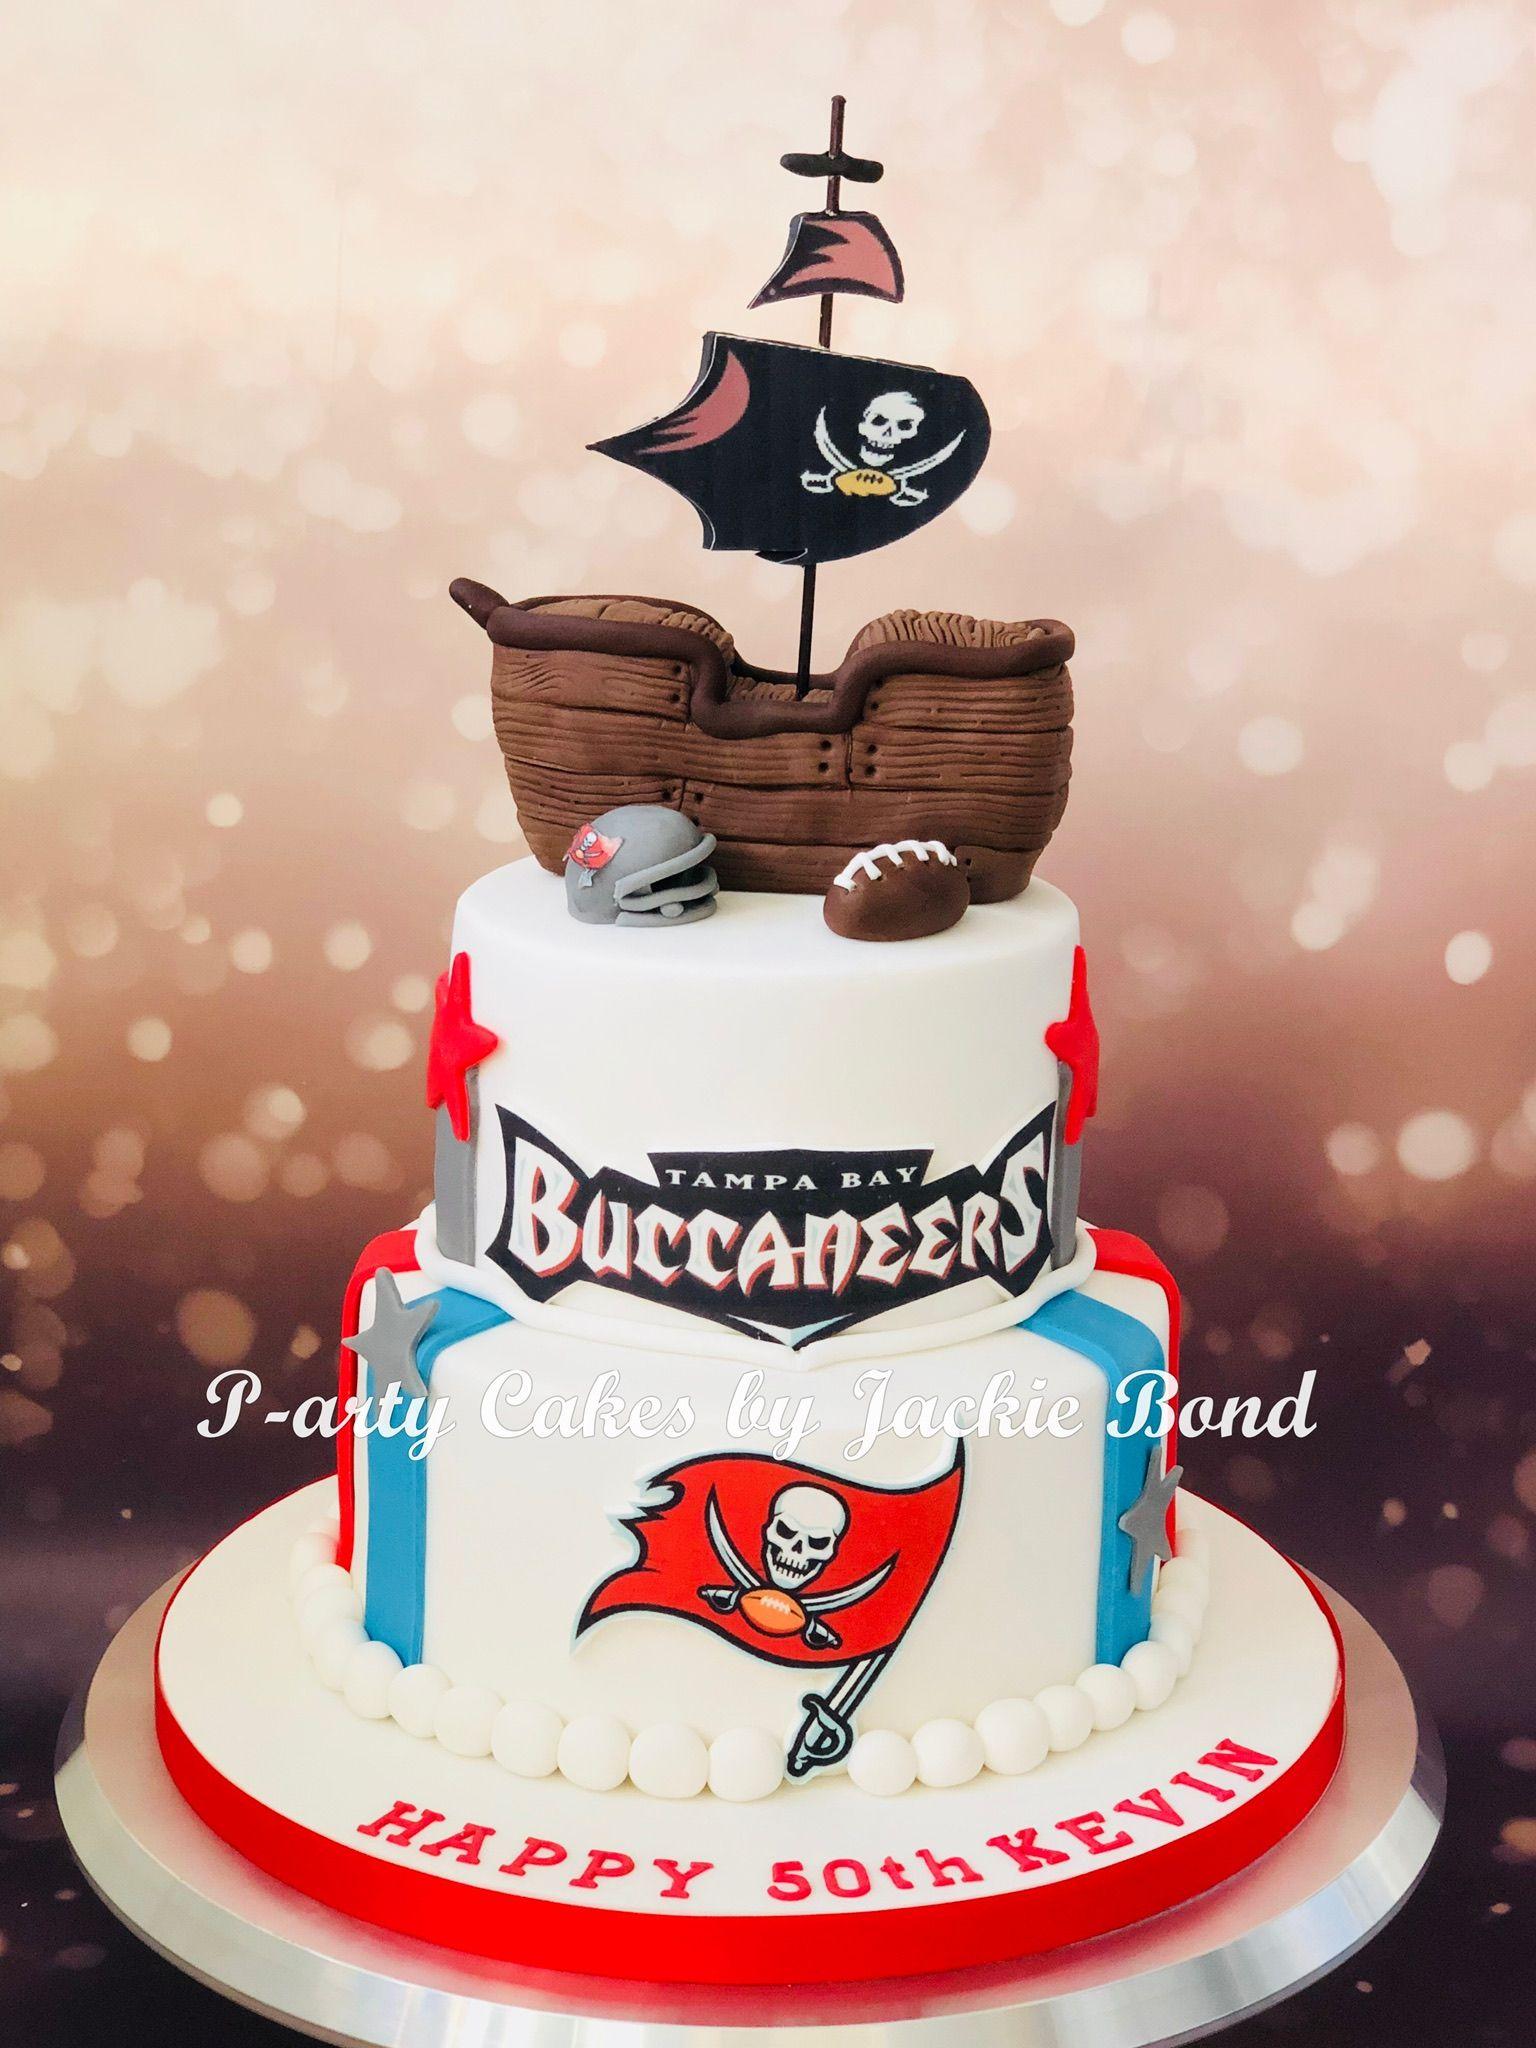 Tampa Bay Buccaneers Cake Cupcake Cakes Cake Homemade Cakes